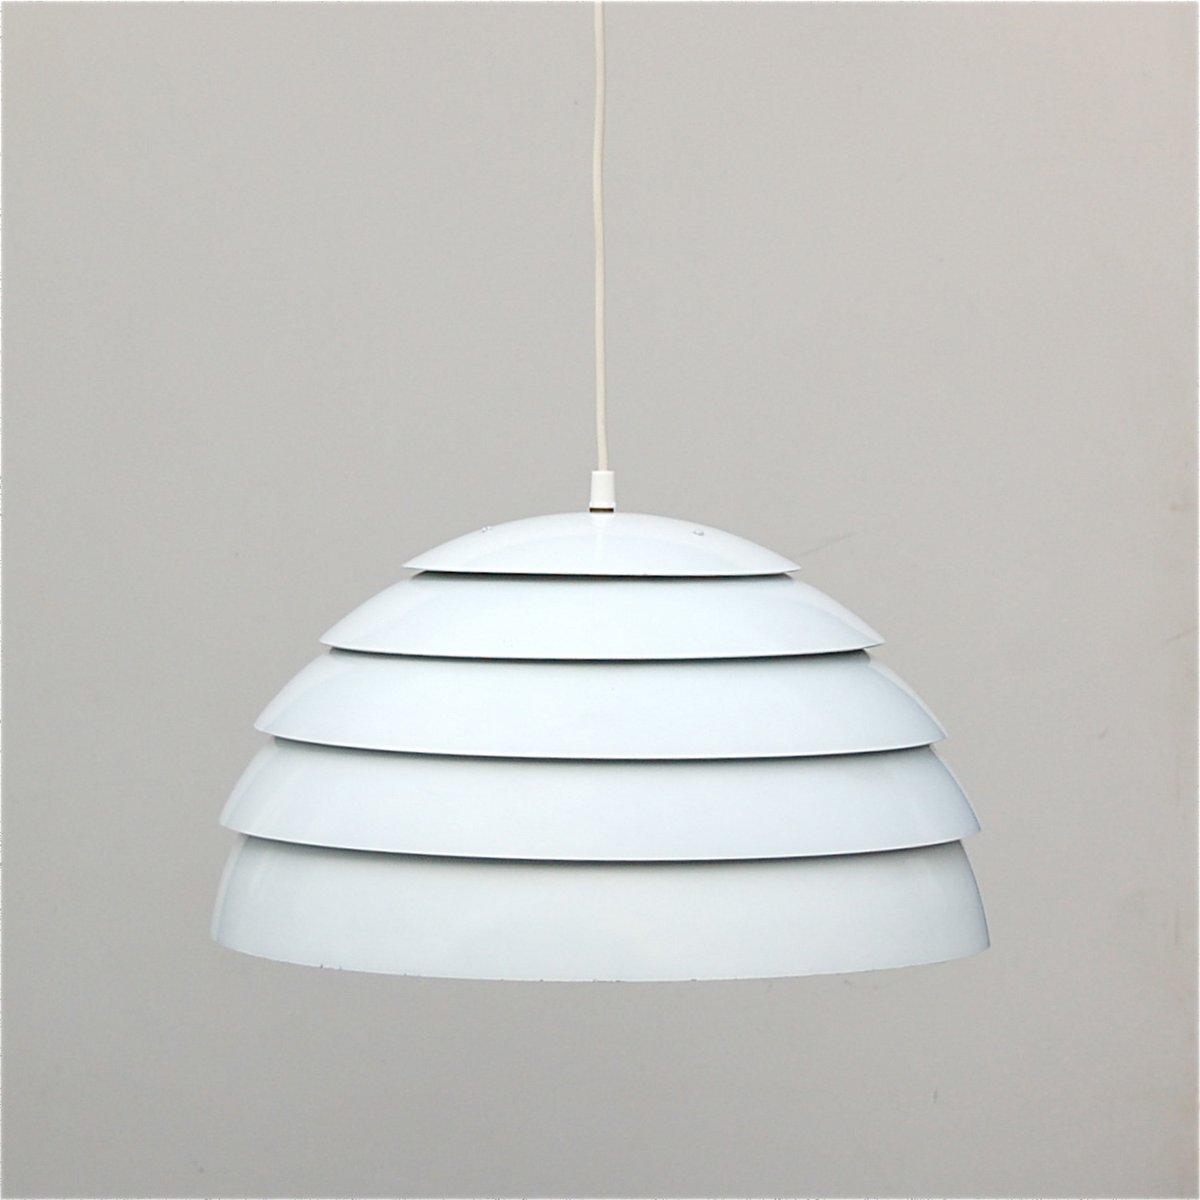 Vintage white dome pendant lamp by hans agne jakobsson for vintage white dome pendant lamp by hans agne jakobsson for markaryd 1960s for sale at pamono arubaitofo Gallery